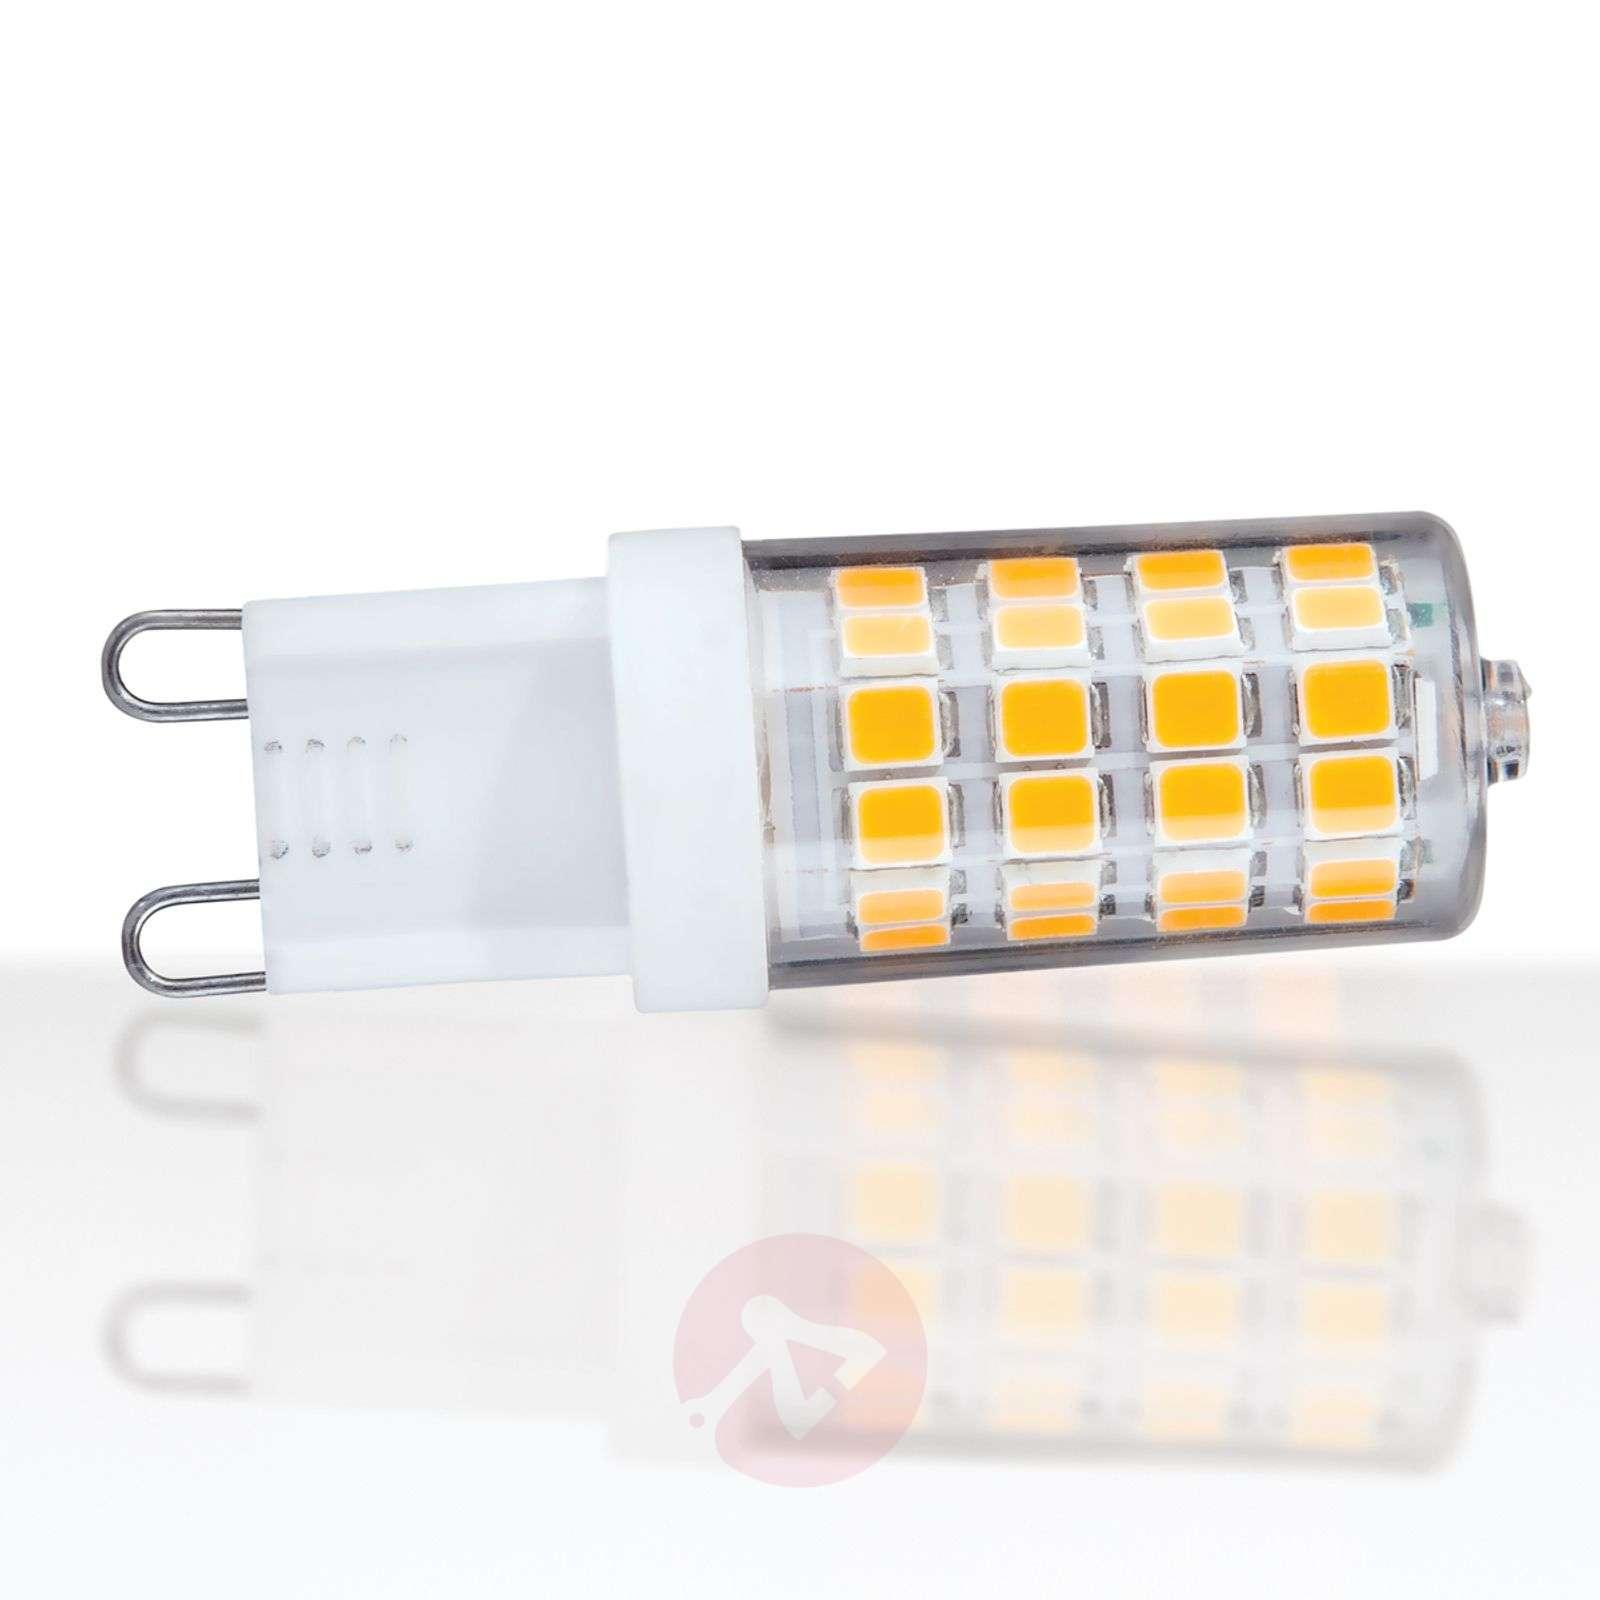 G9 4 W 828 LED bi-pin bulb-7255114-01